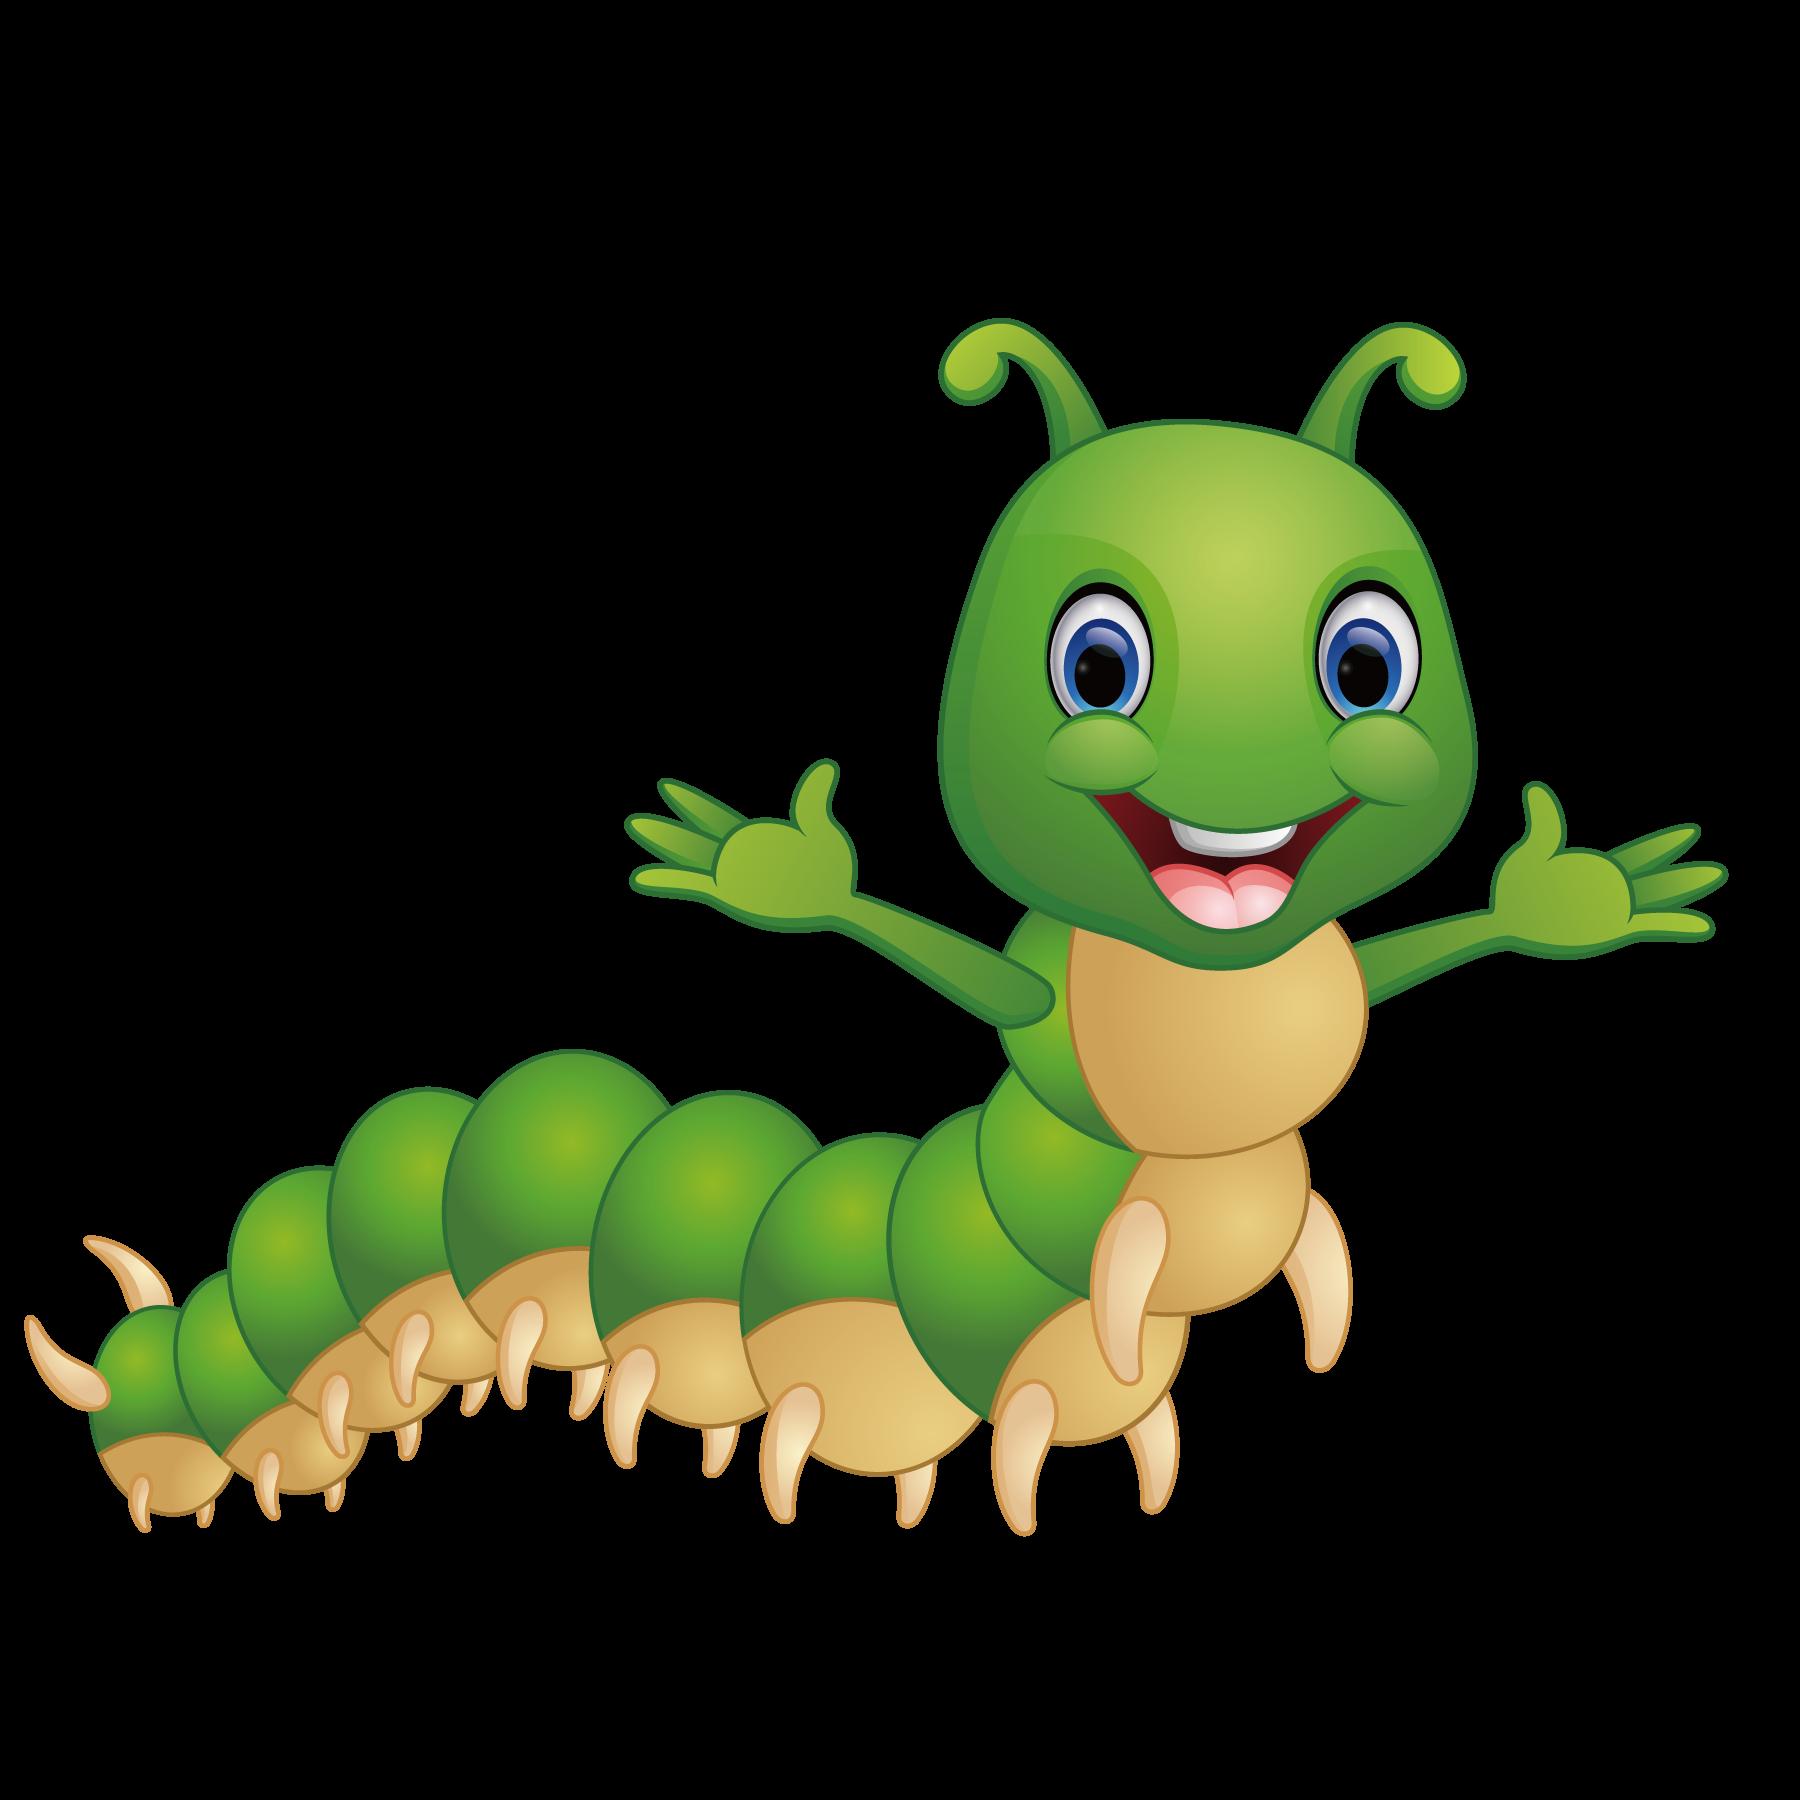 Caterpillar inc illustration.